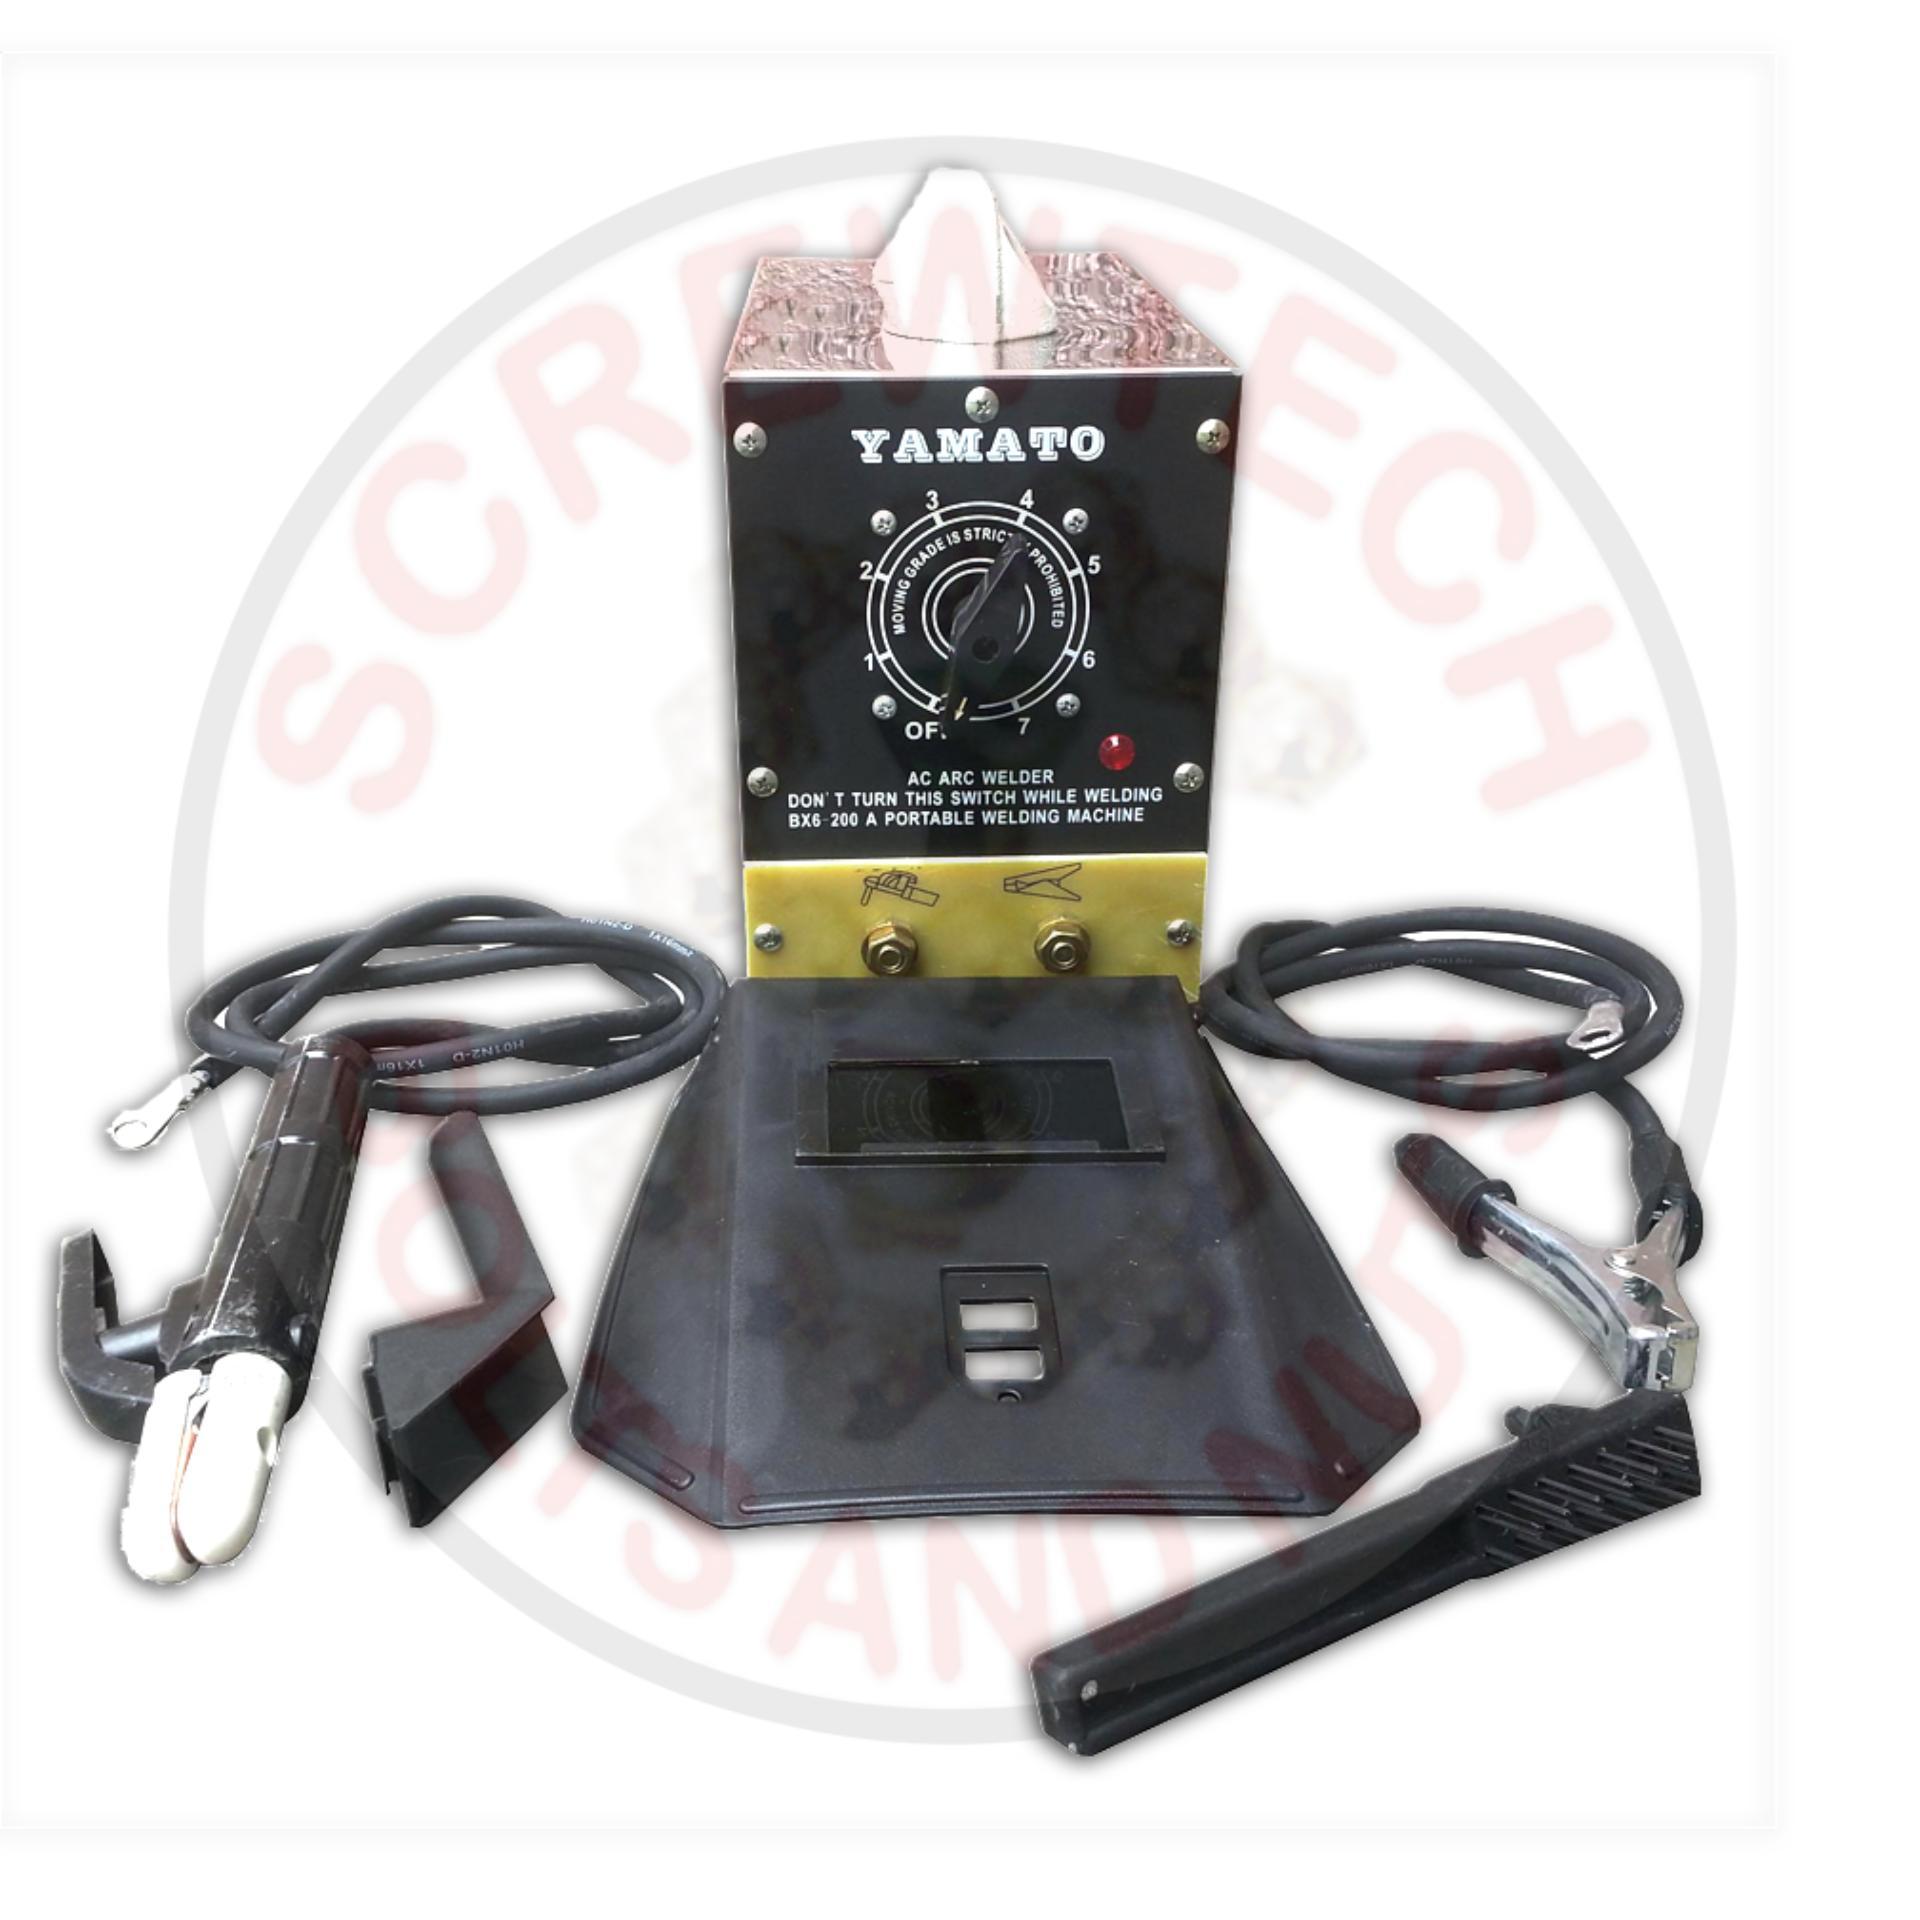 Yamato Stainless Portable Welding Machine 300AMP